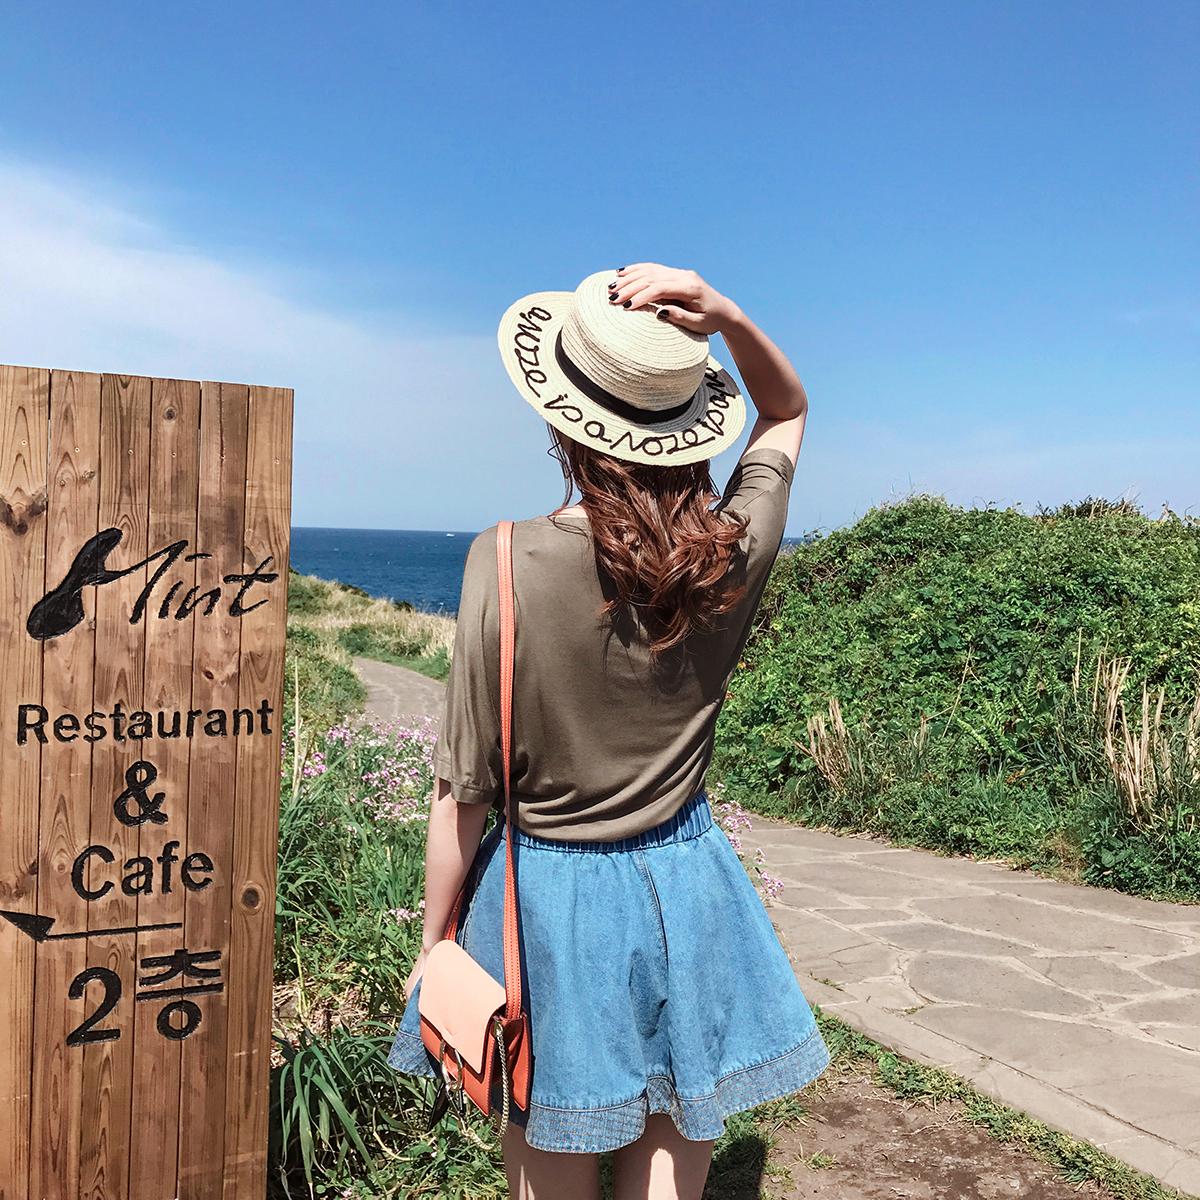 ◆MUGU蘑菇◆ 浅色宽松简单T恤女不规则个性打底衫短袖上衣女夏装3元优惠券